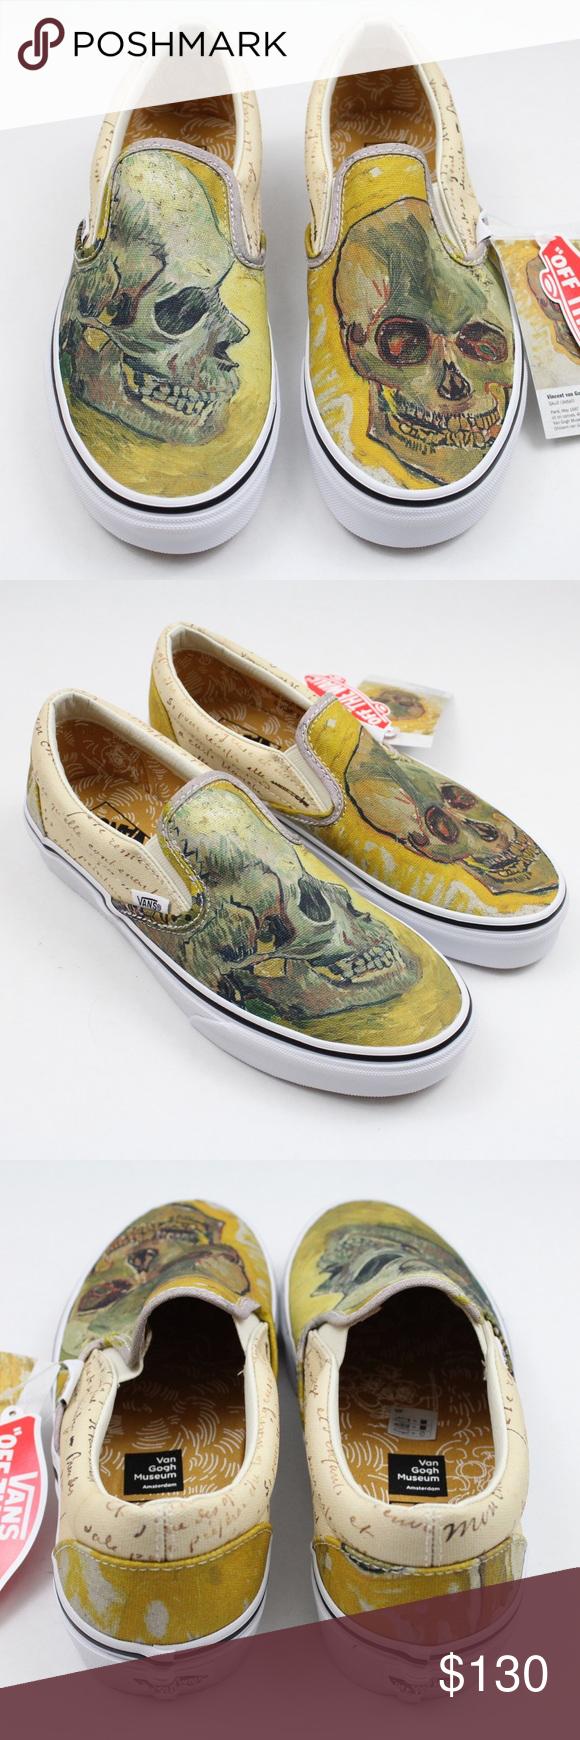 Vans Vincent Van Gogh Skull Classic Slip On Vans Vans Classic Slip On Sneaker Slip On